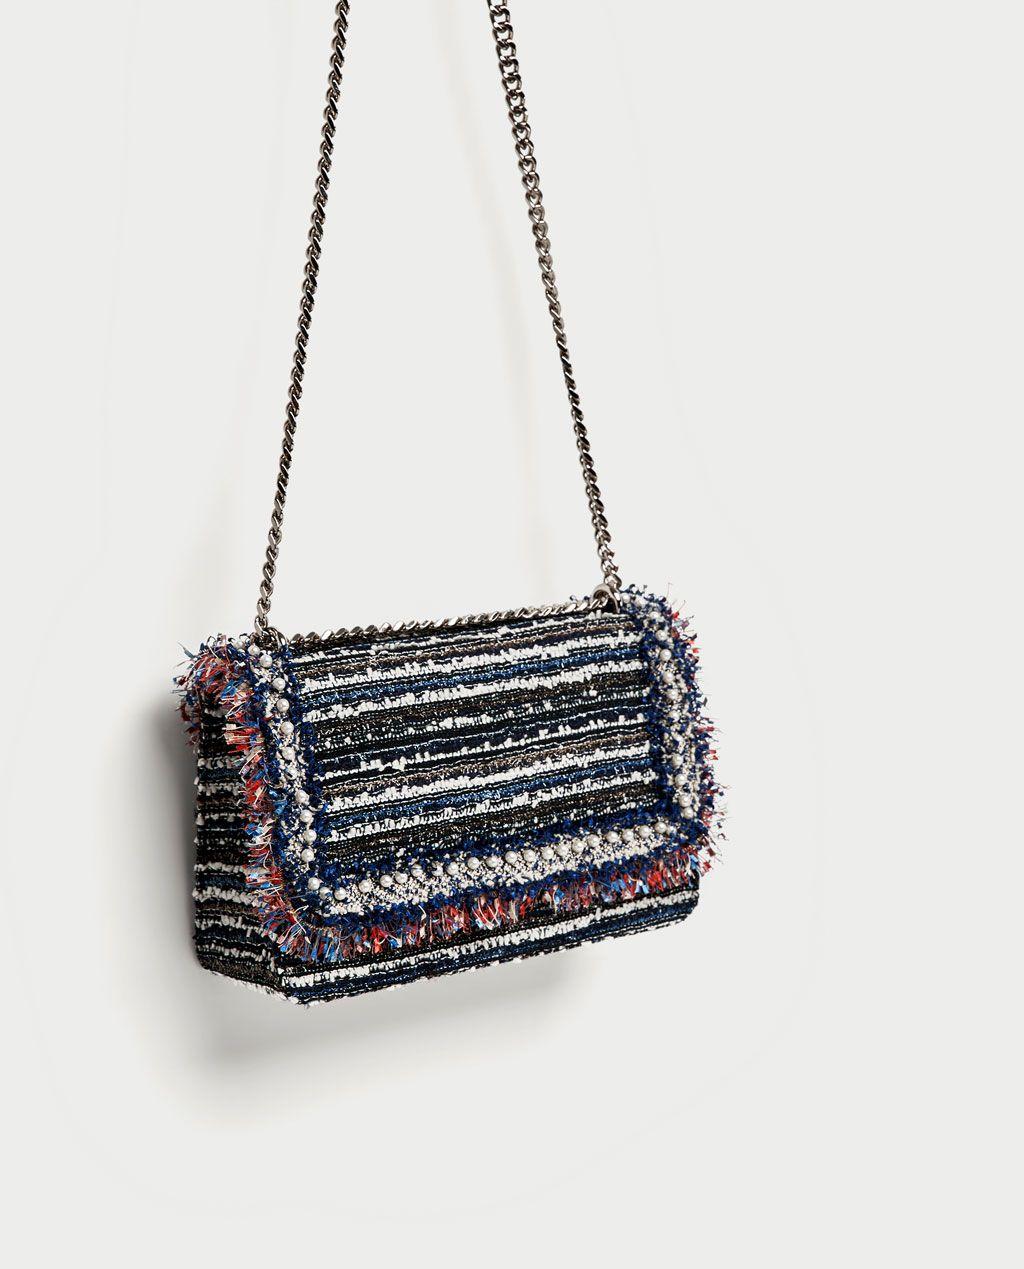 Tassen Dames Body Bags Schoudertas Cross Nederland Stoffen Zara qCSpX